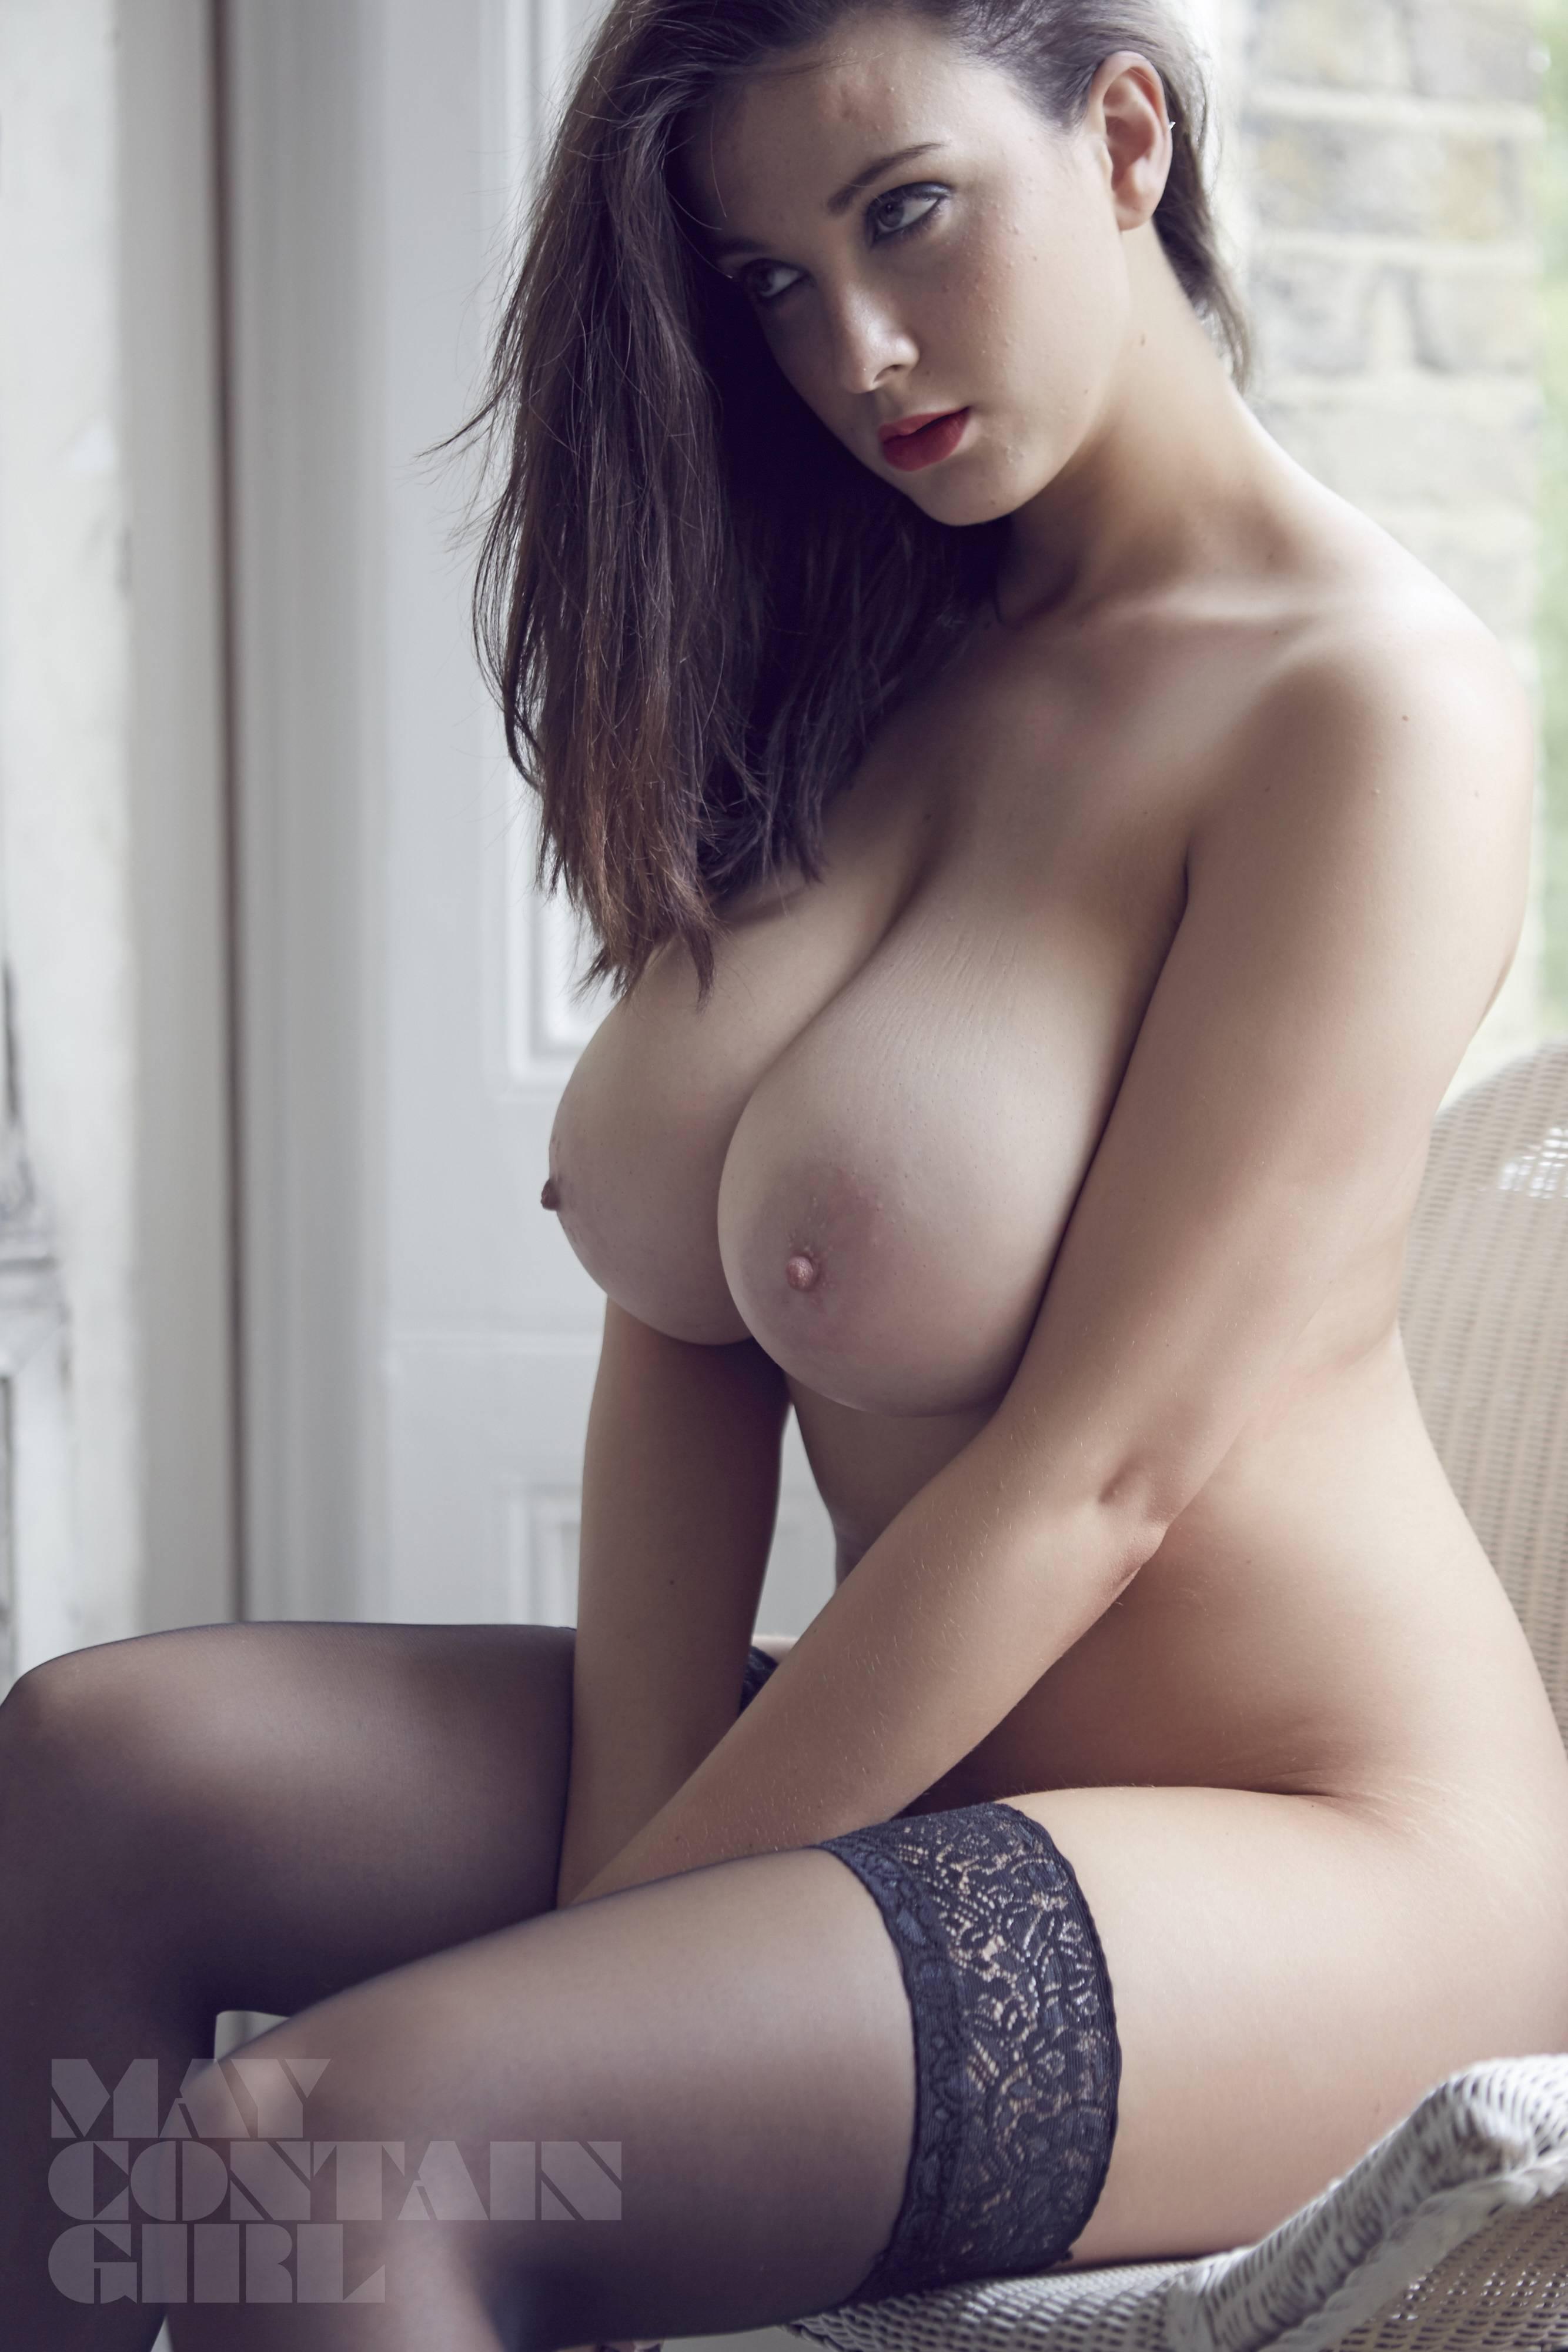 Nude women on sports cars